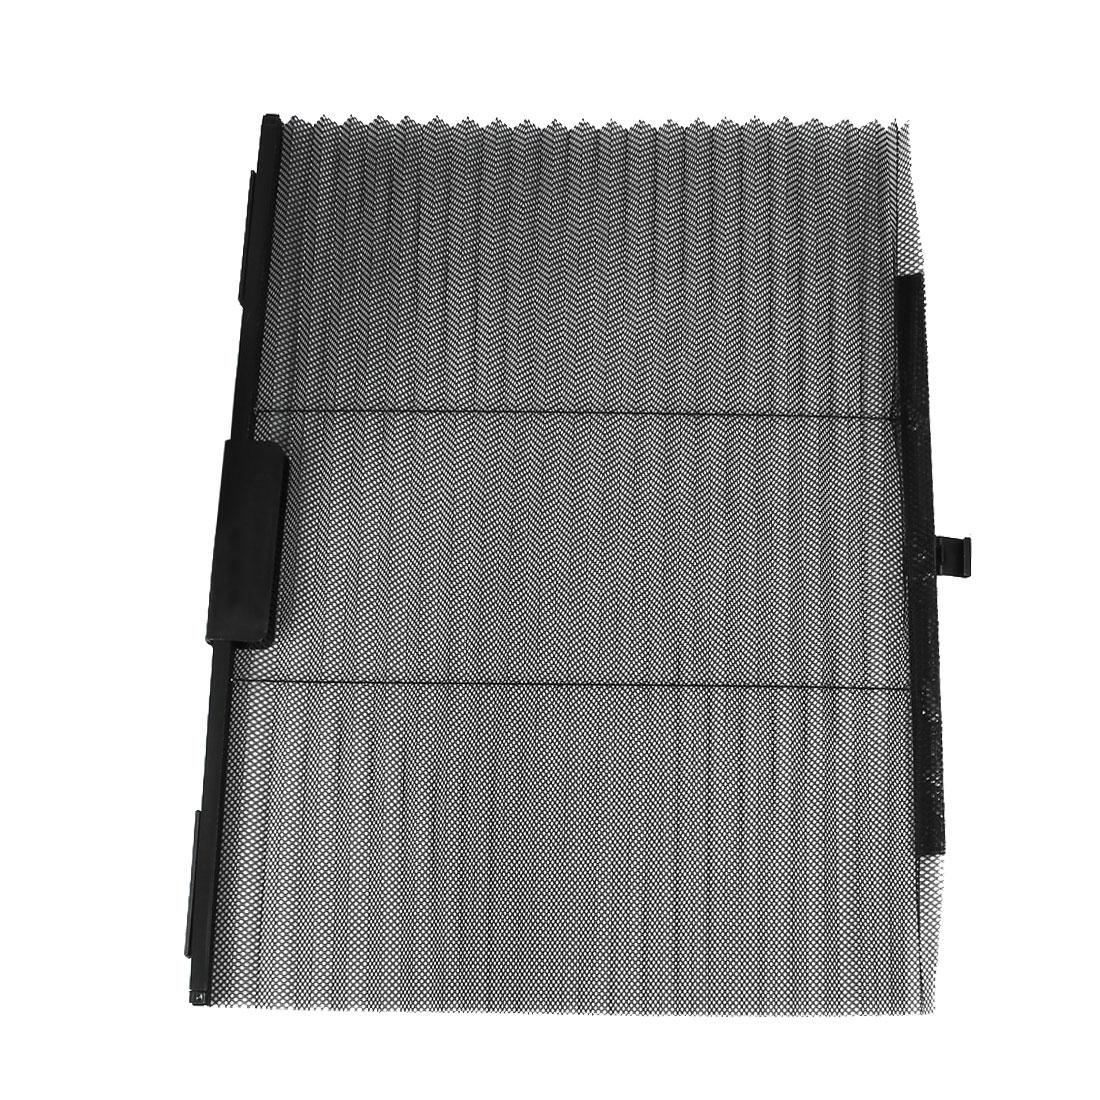 "24"" x 19"" Retractable Auto Car Internal Window Curtains Sun Shades Black"